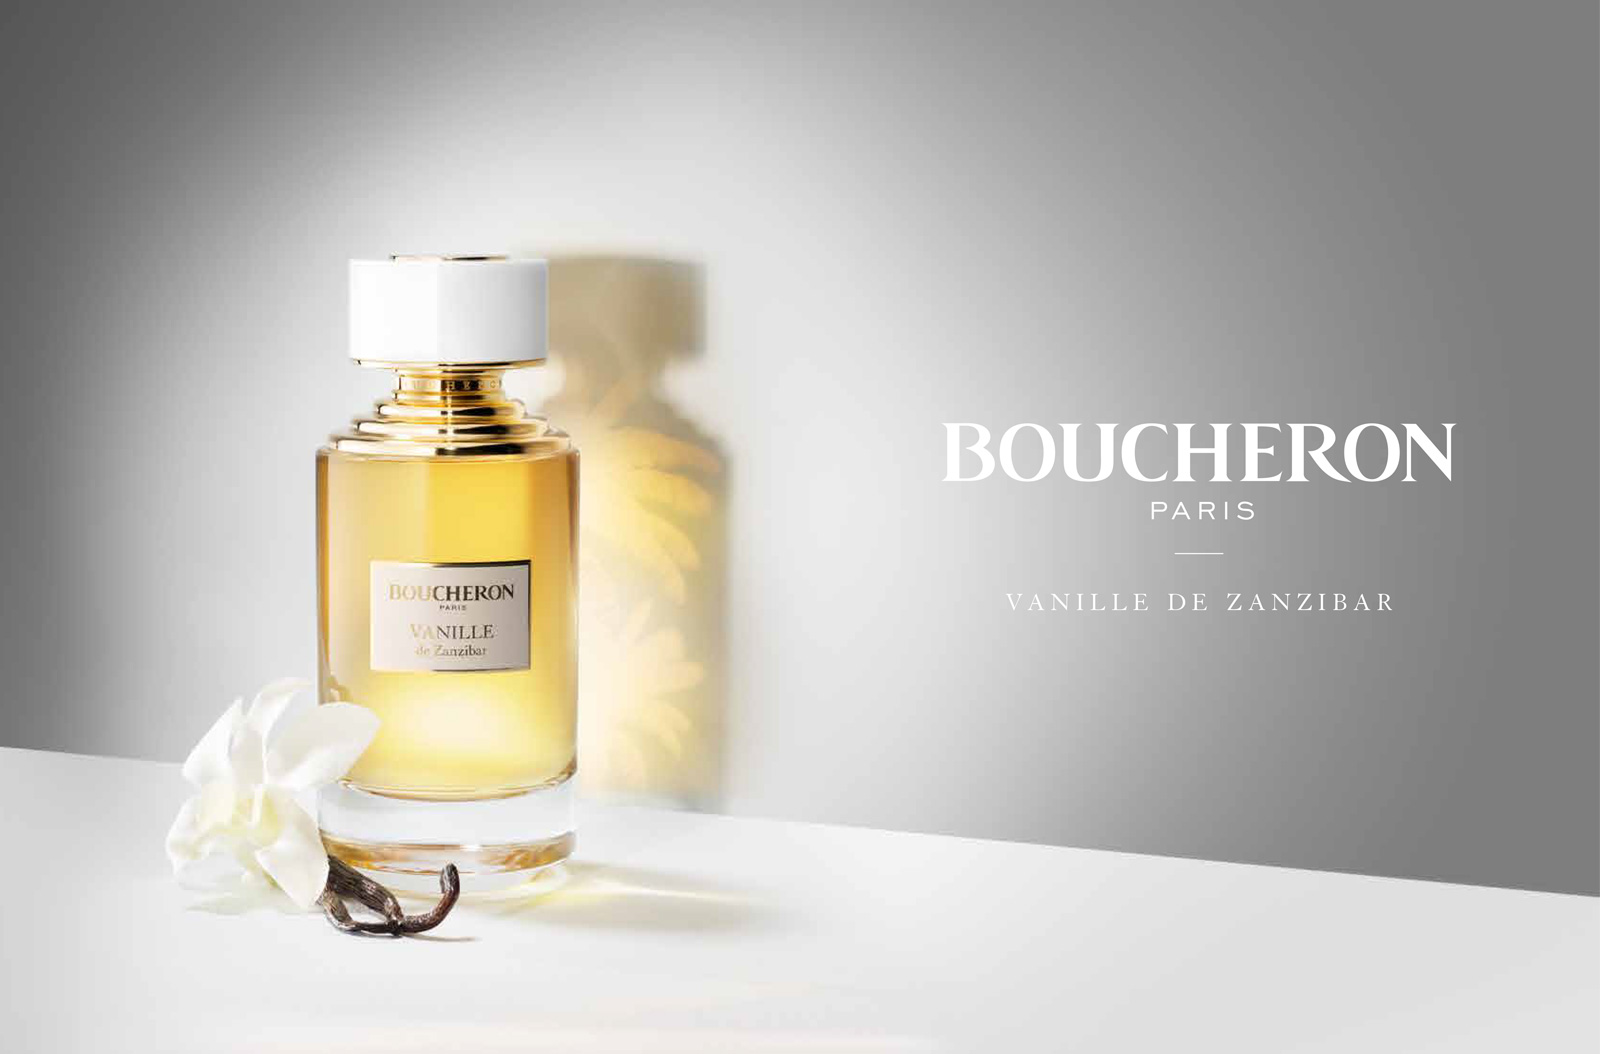 boucheron parfym dam